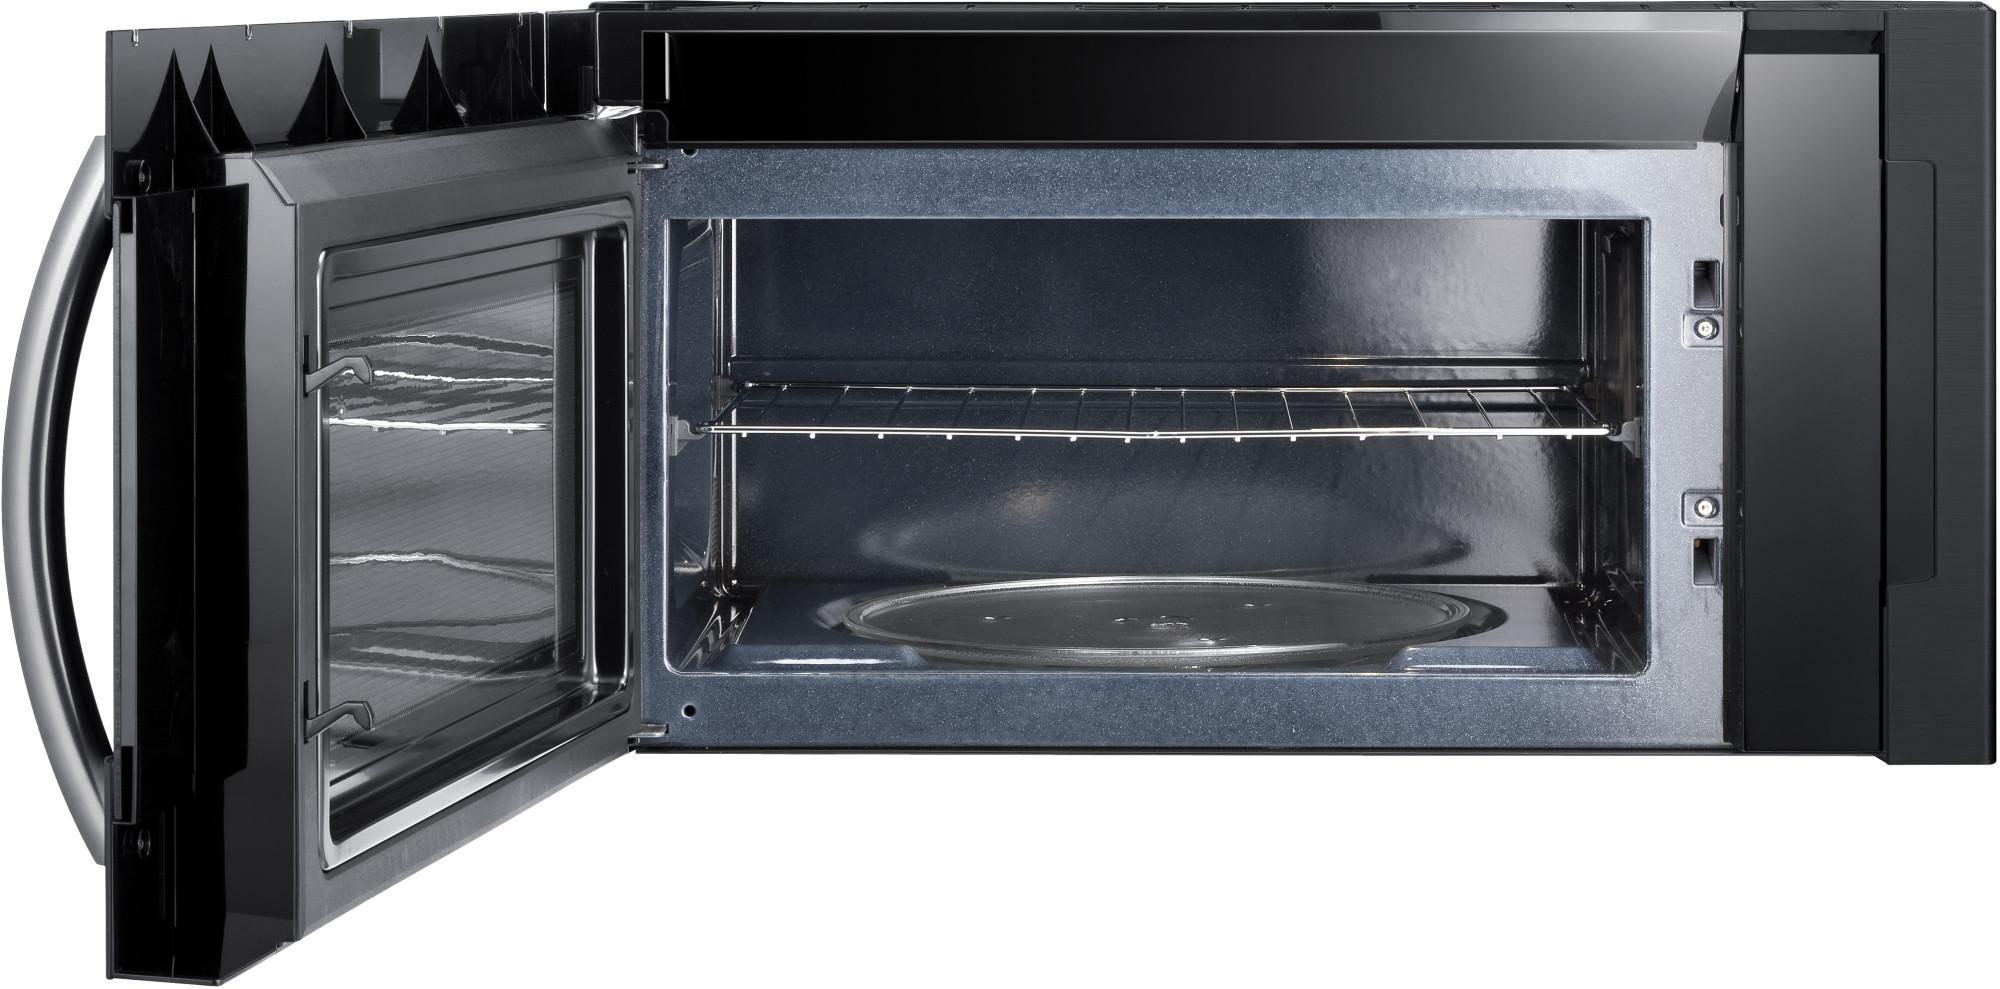 Mc17j8000c Samsung Mc17j8000c Over The Range Microwaves